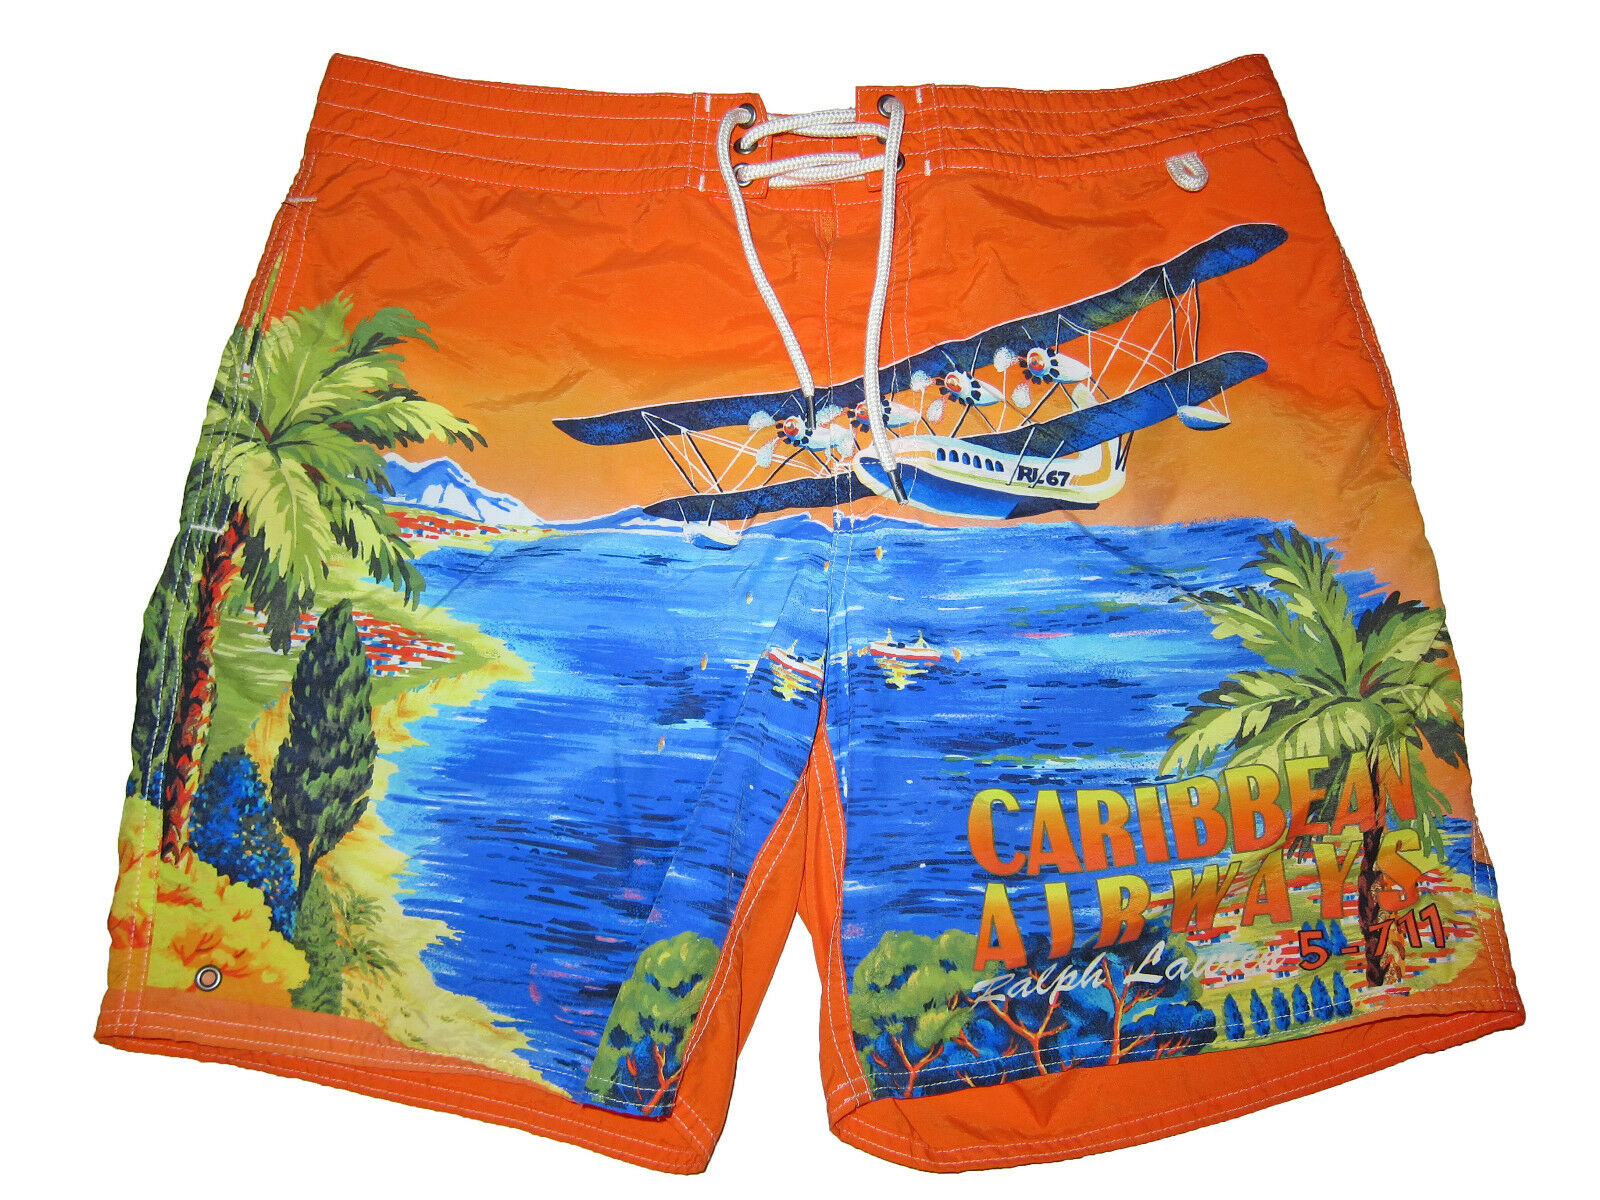 Rare Polo Ralph Lauren orange bluee Caribbean Airways Swim Board Shorts Suit 28